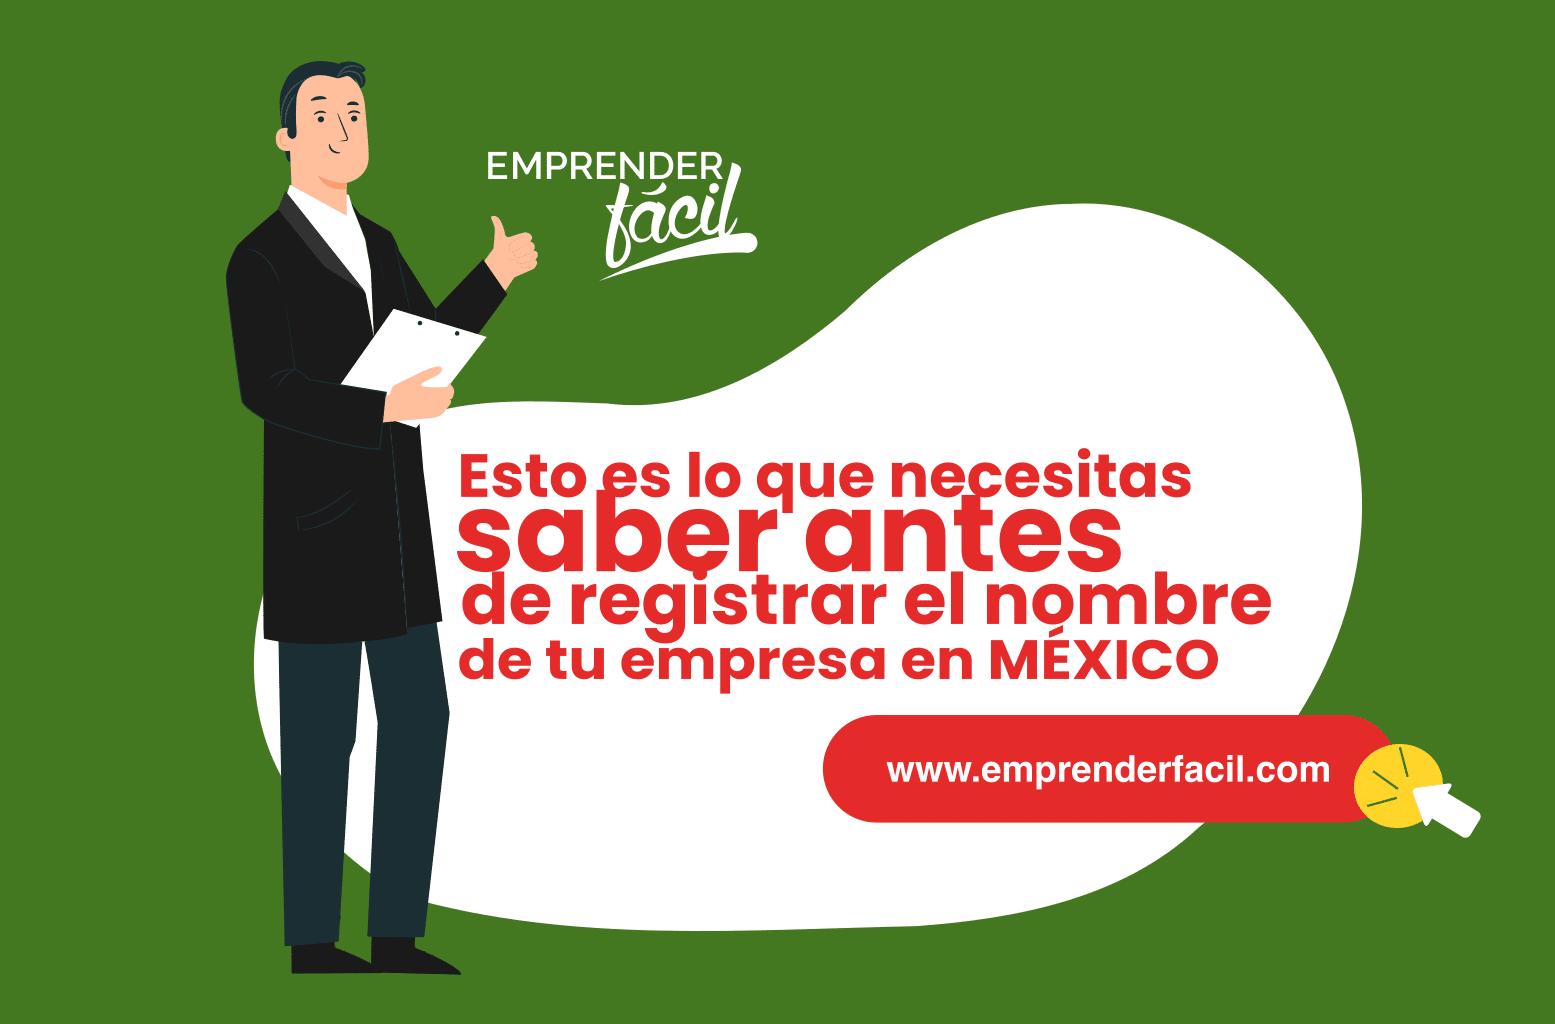 Emprender en México